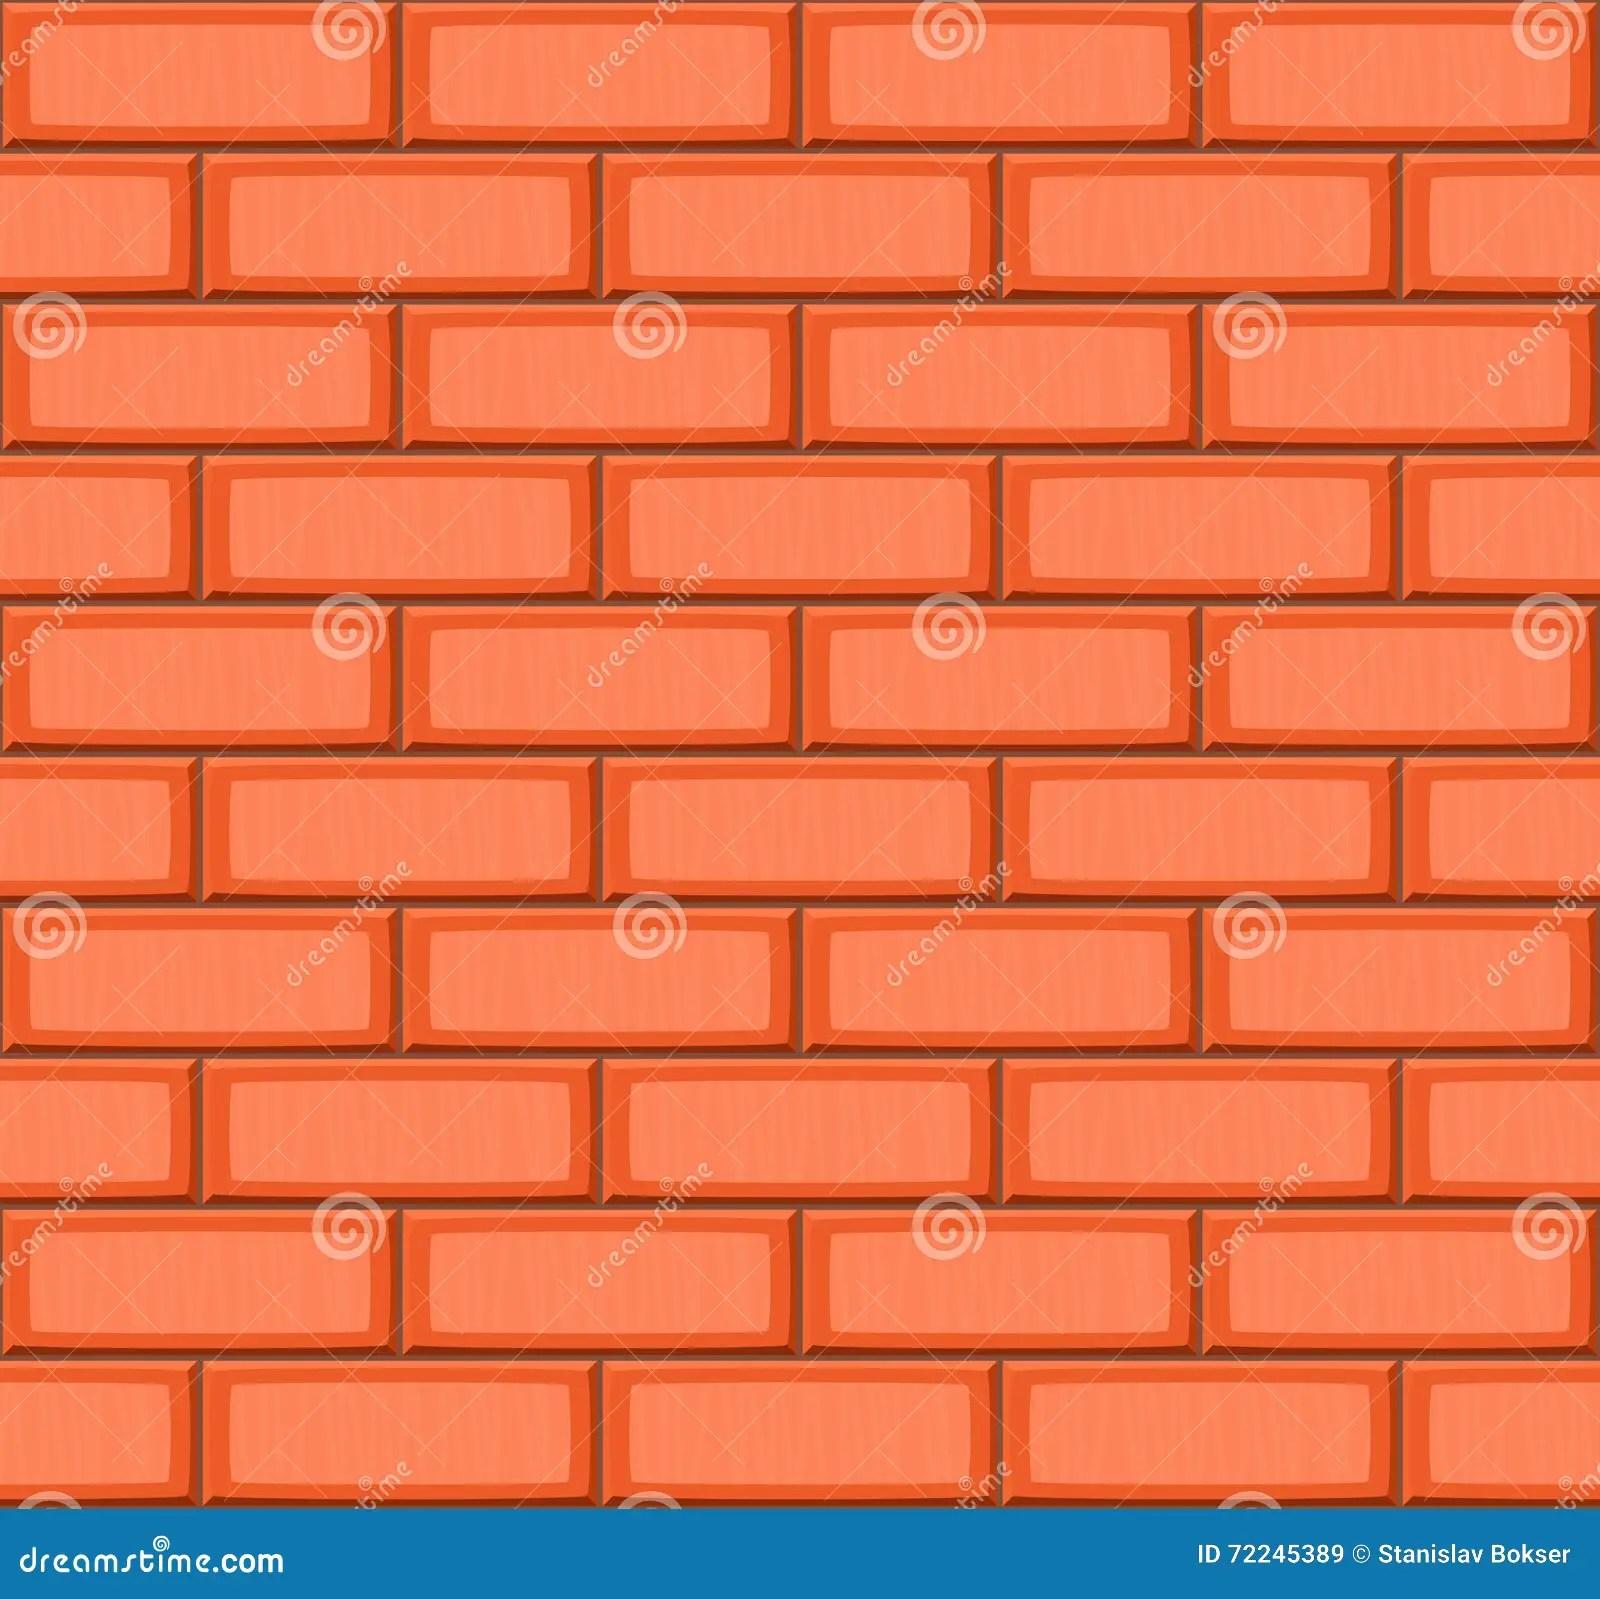 Layout X 6 Tile 24 Tile